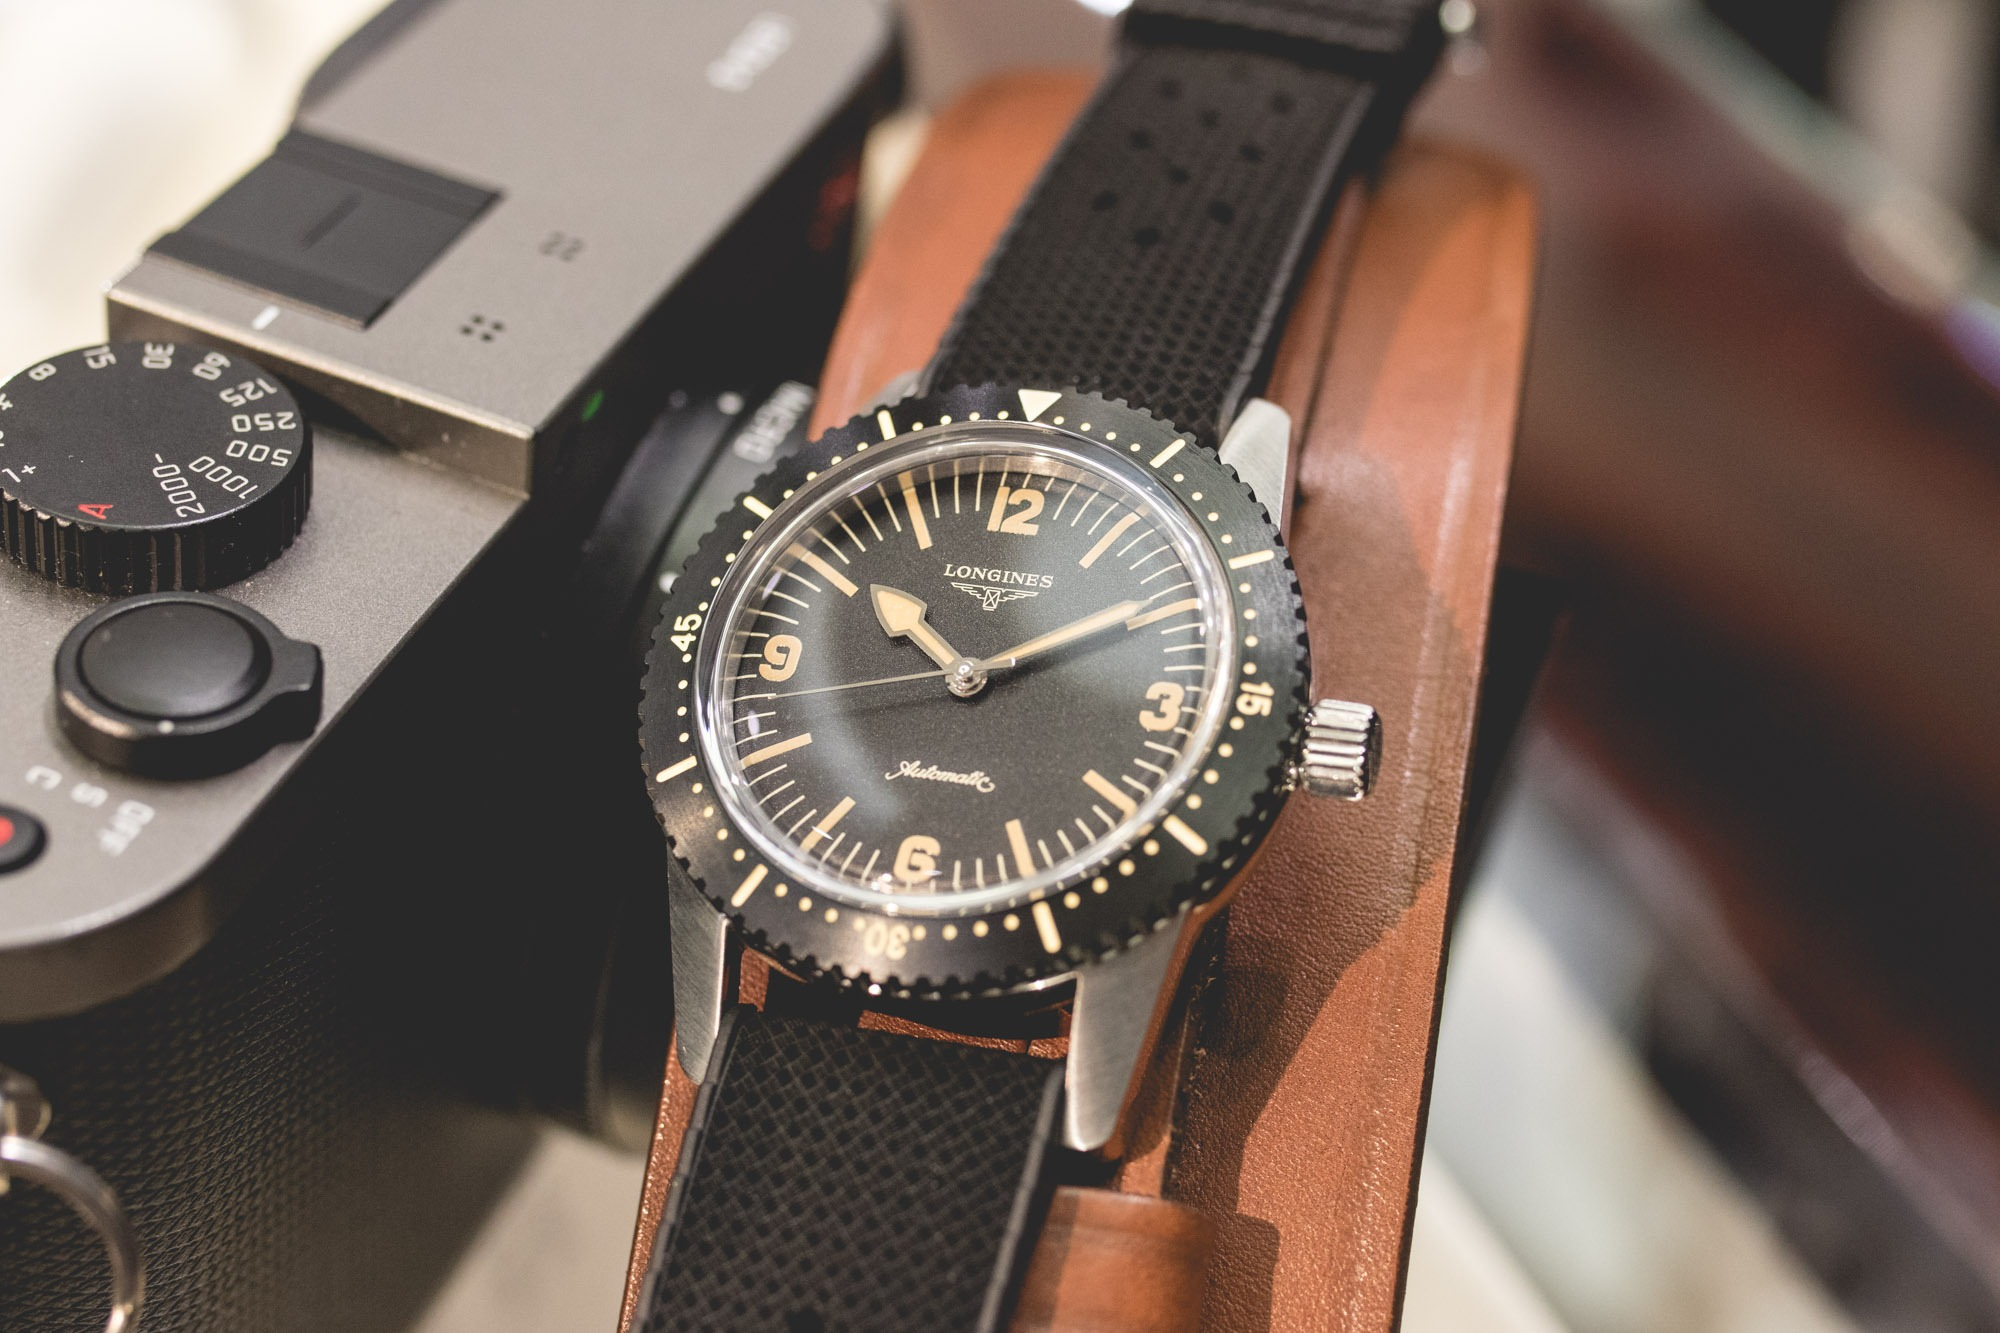 Baselworld 2018 - Longines Heritage Skin Diver Cadran